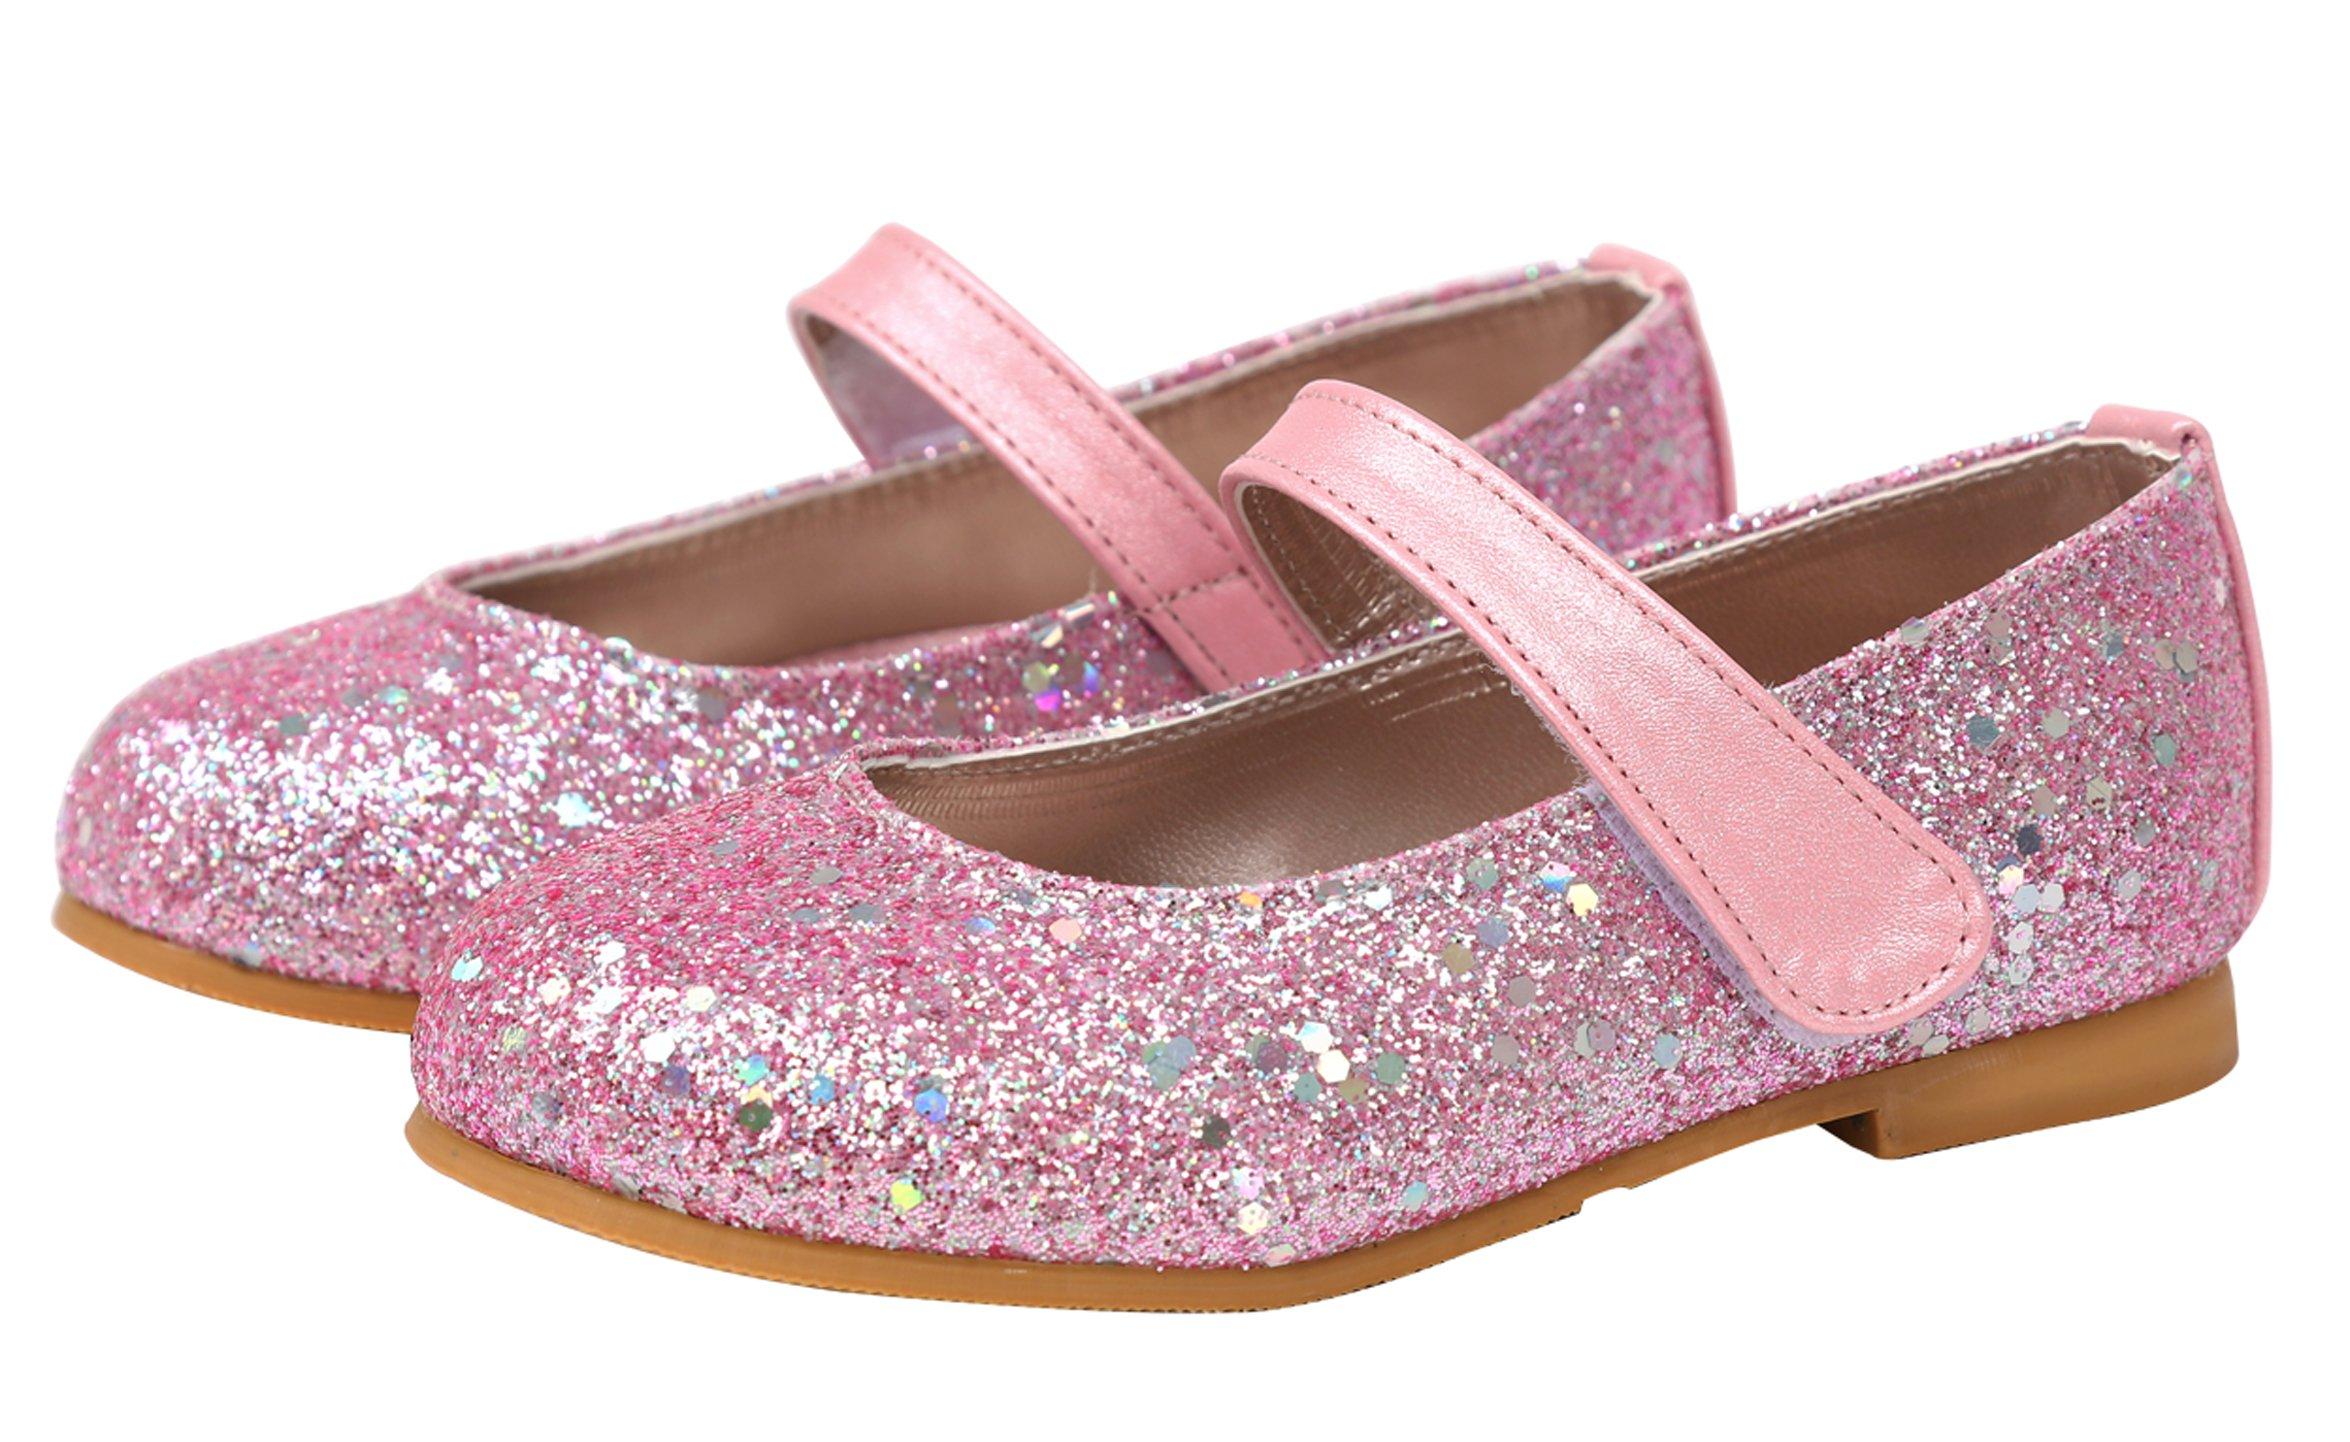 Ozkiz Toddler Little Girls Ballet Flat Shoes PK 13m